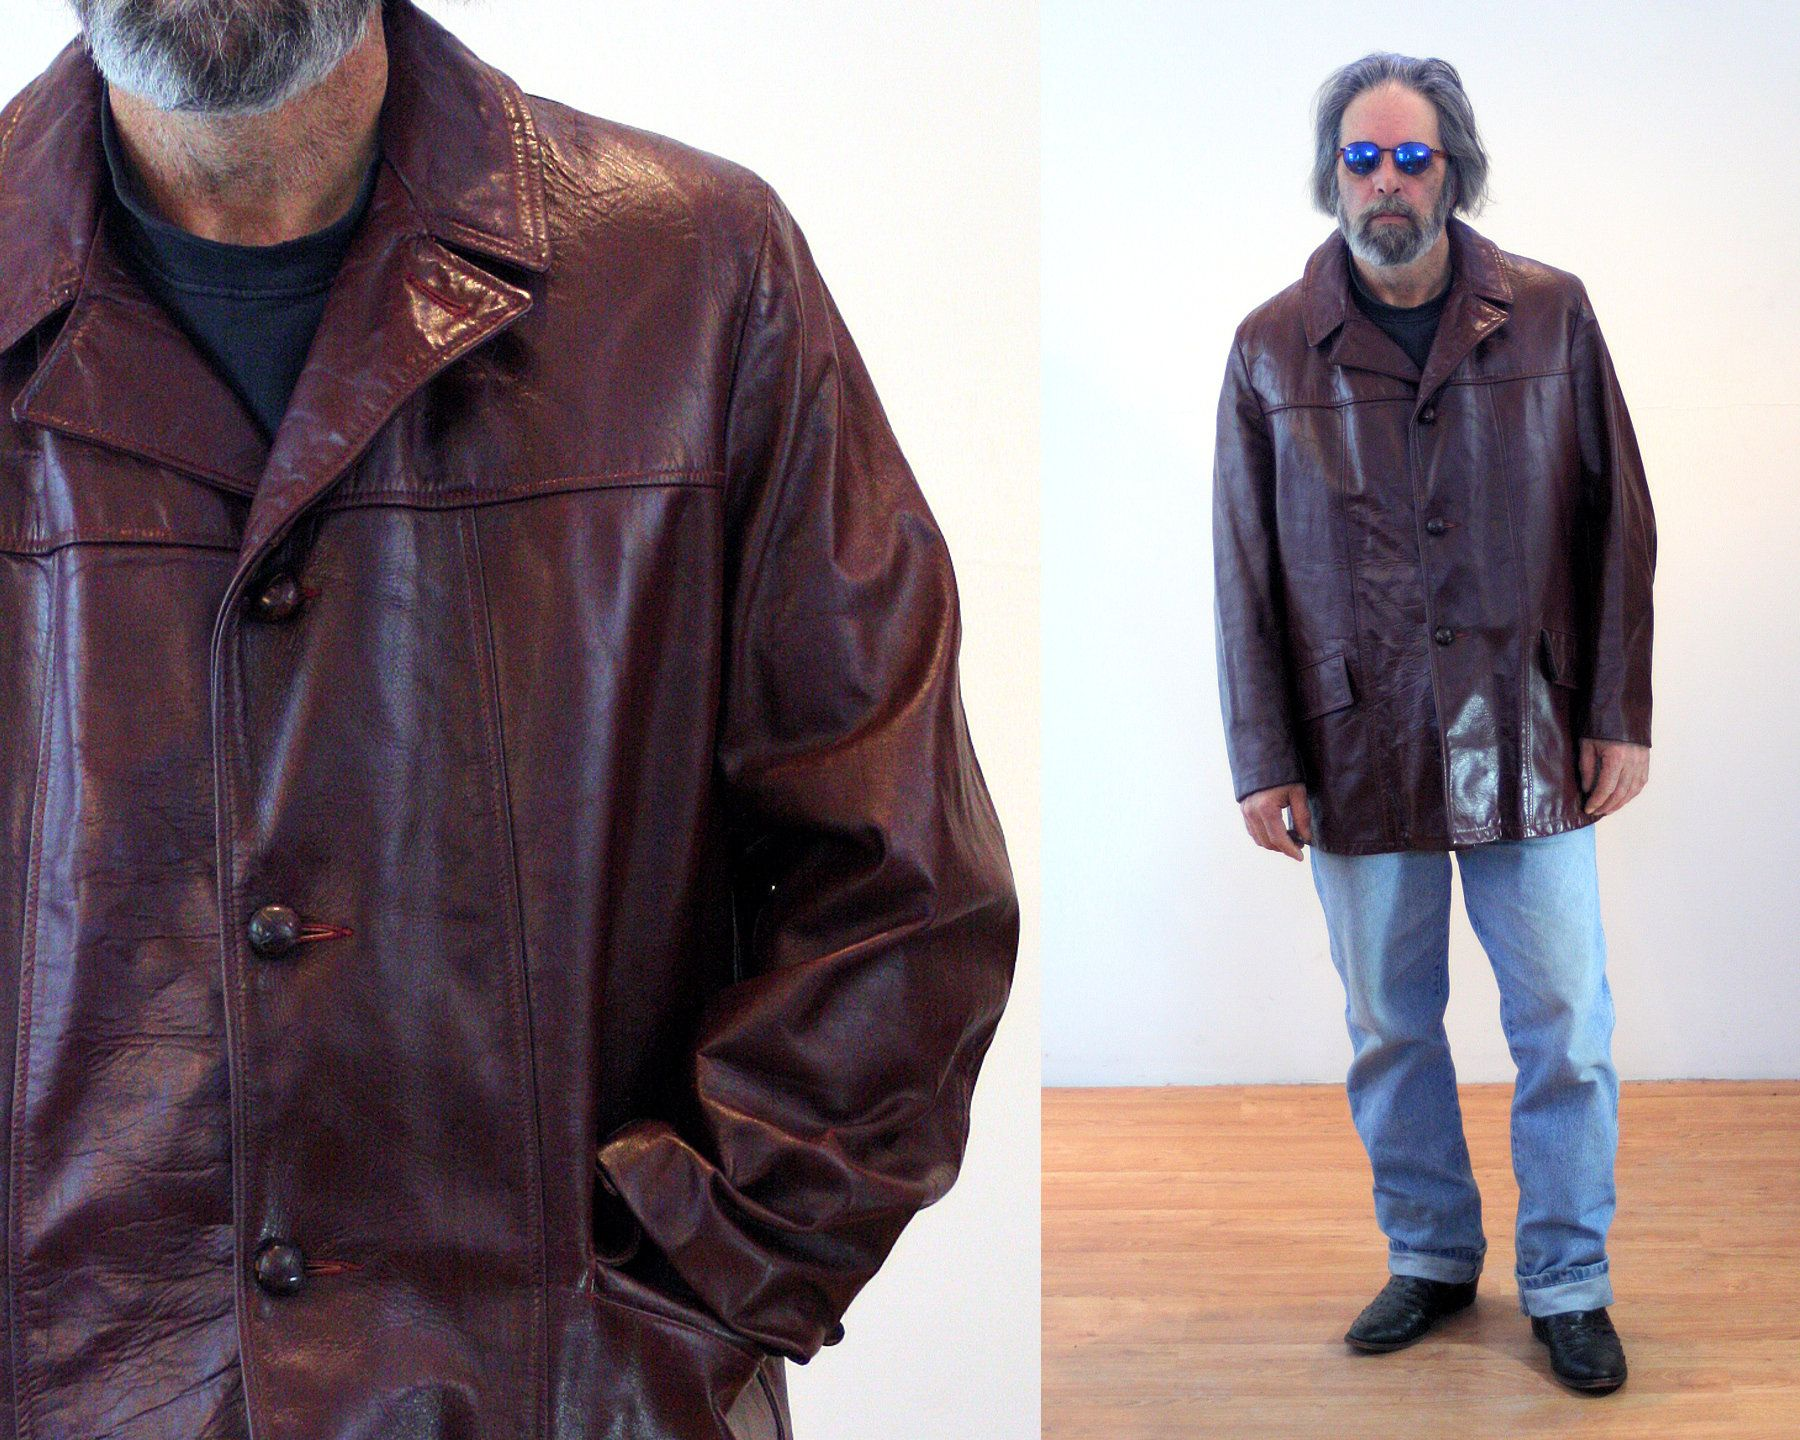 70s Leather Jacket 48 Xl Vintage Men S Oxblood Brown Etsy Leather Jacket Mens Leather Coats Vintage Men [ 1440 x 1800 Pixel ]